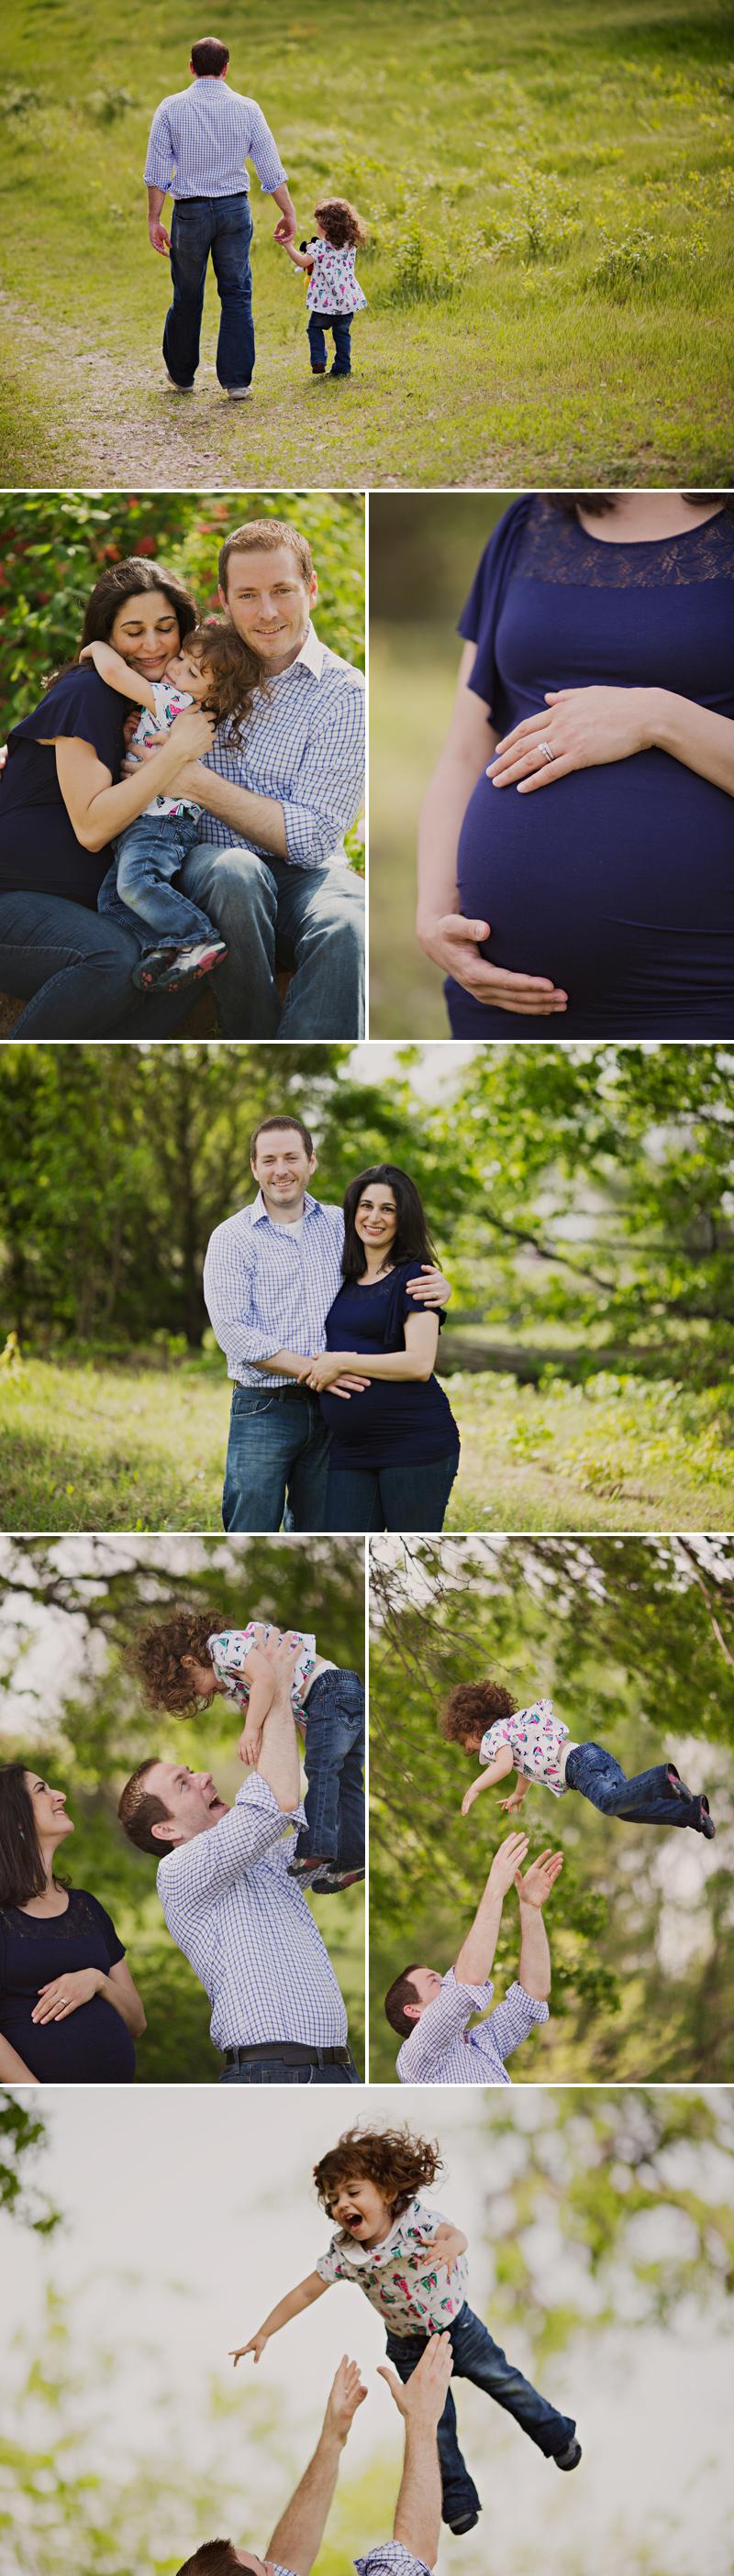 Dallas-Family-Photographercomp004